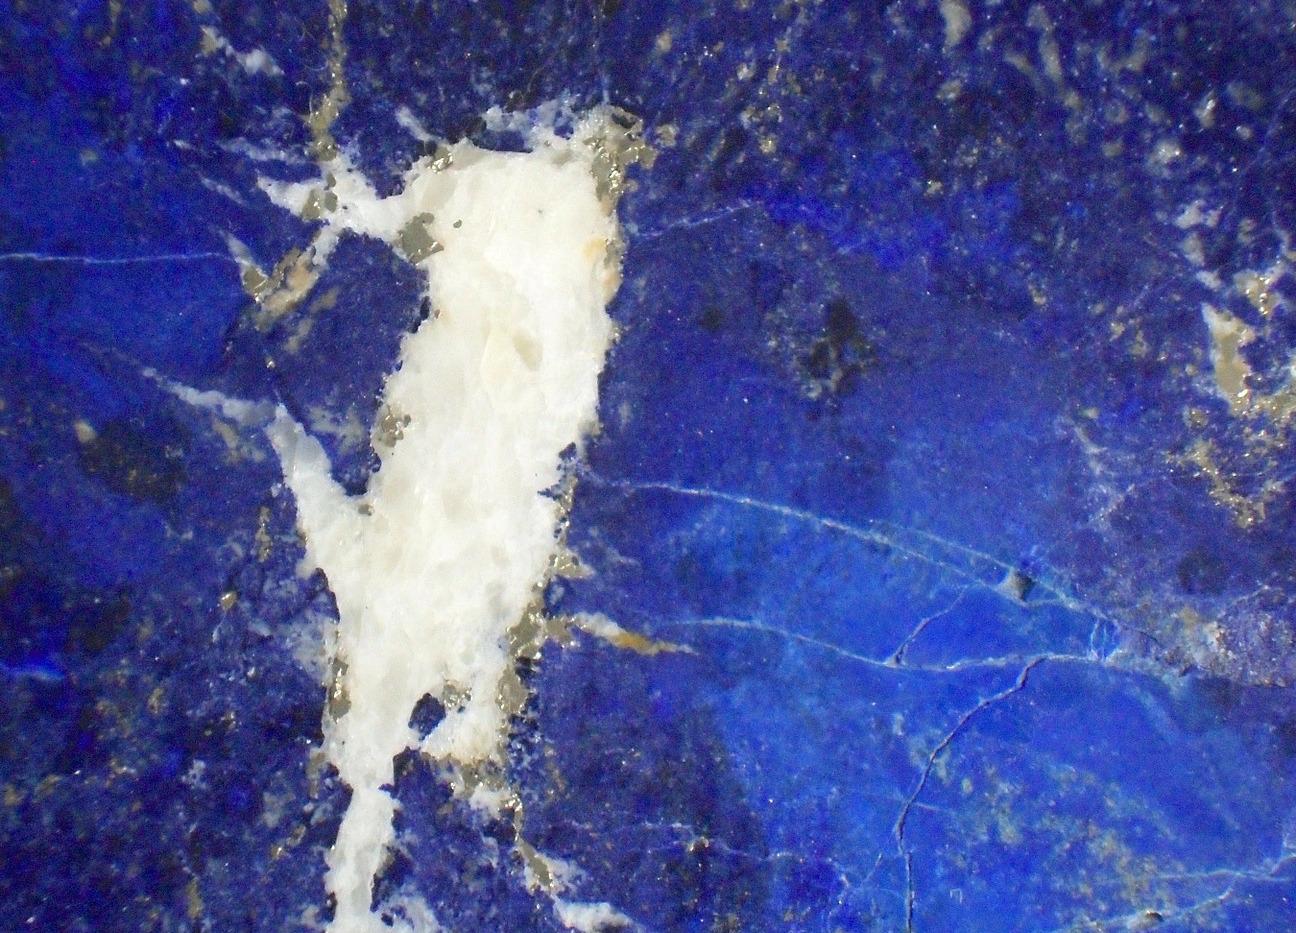 lapis-lazuli-261309_1920 copy.jpg